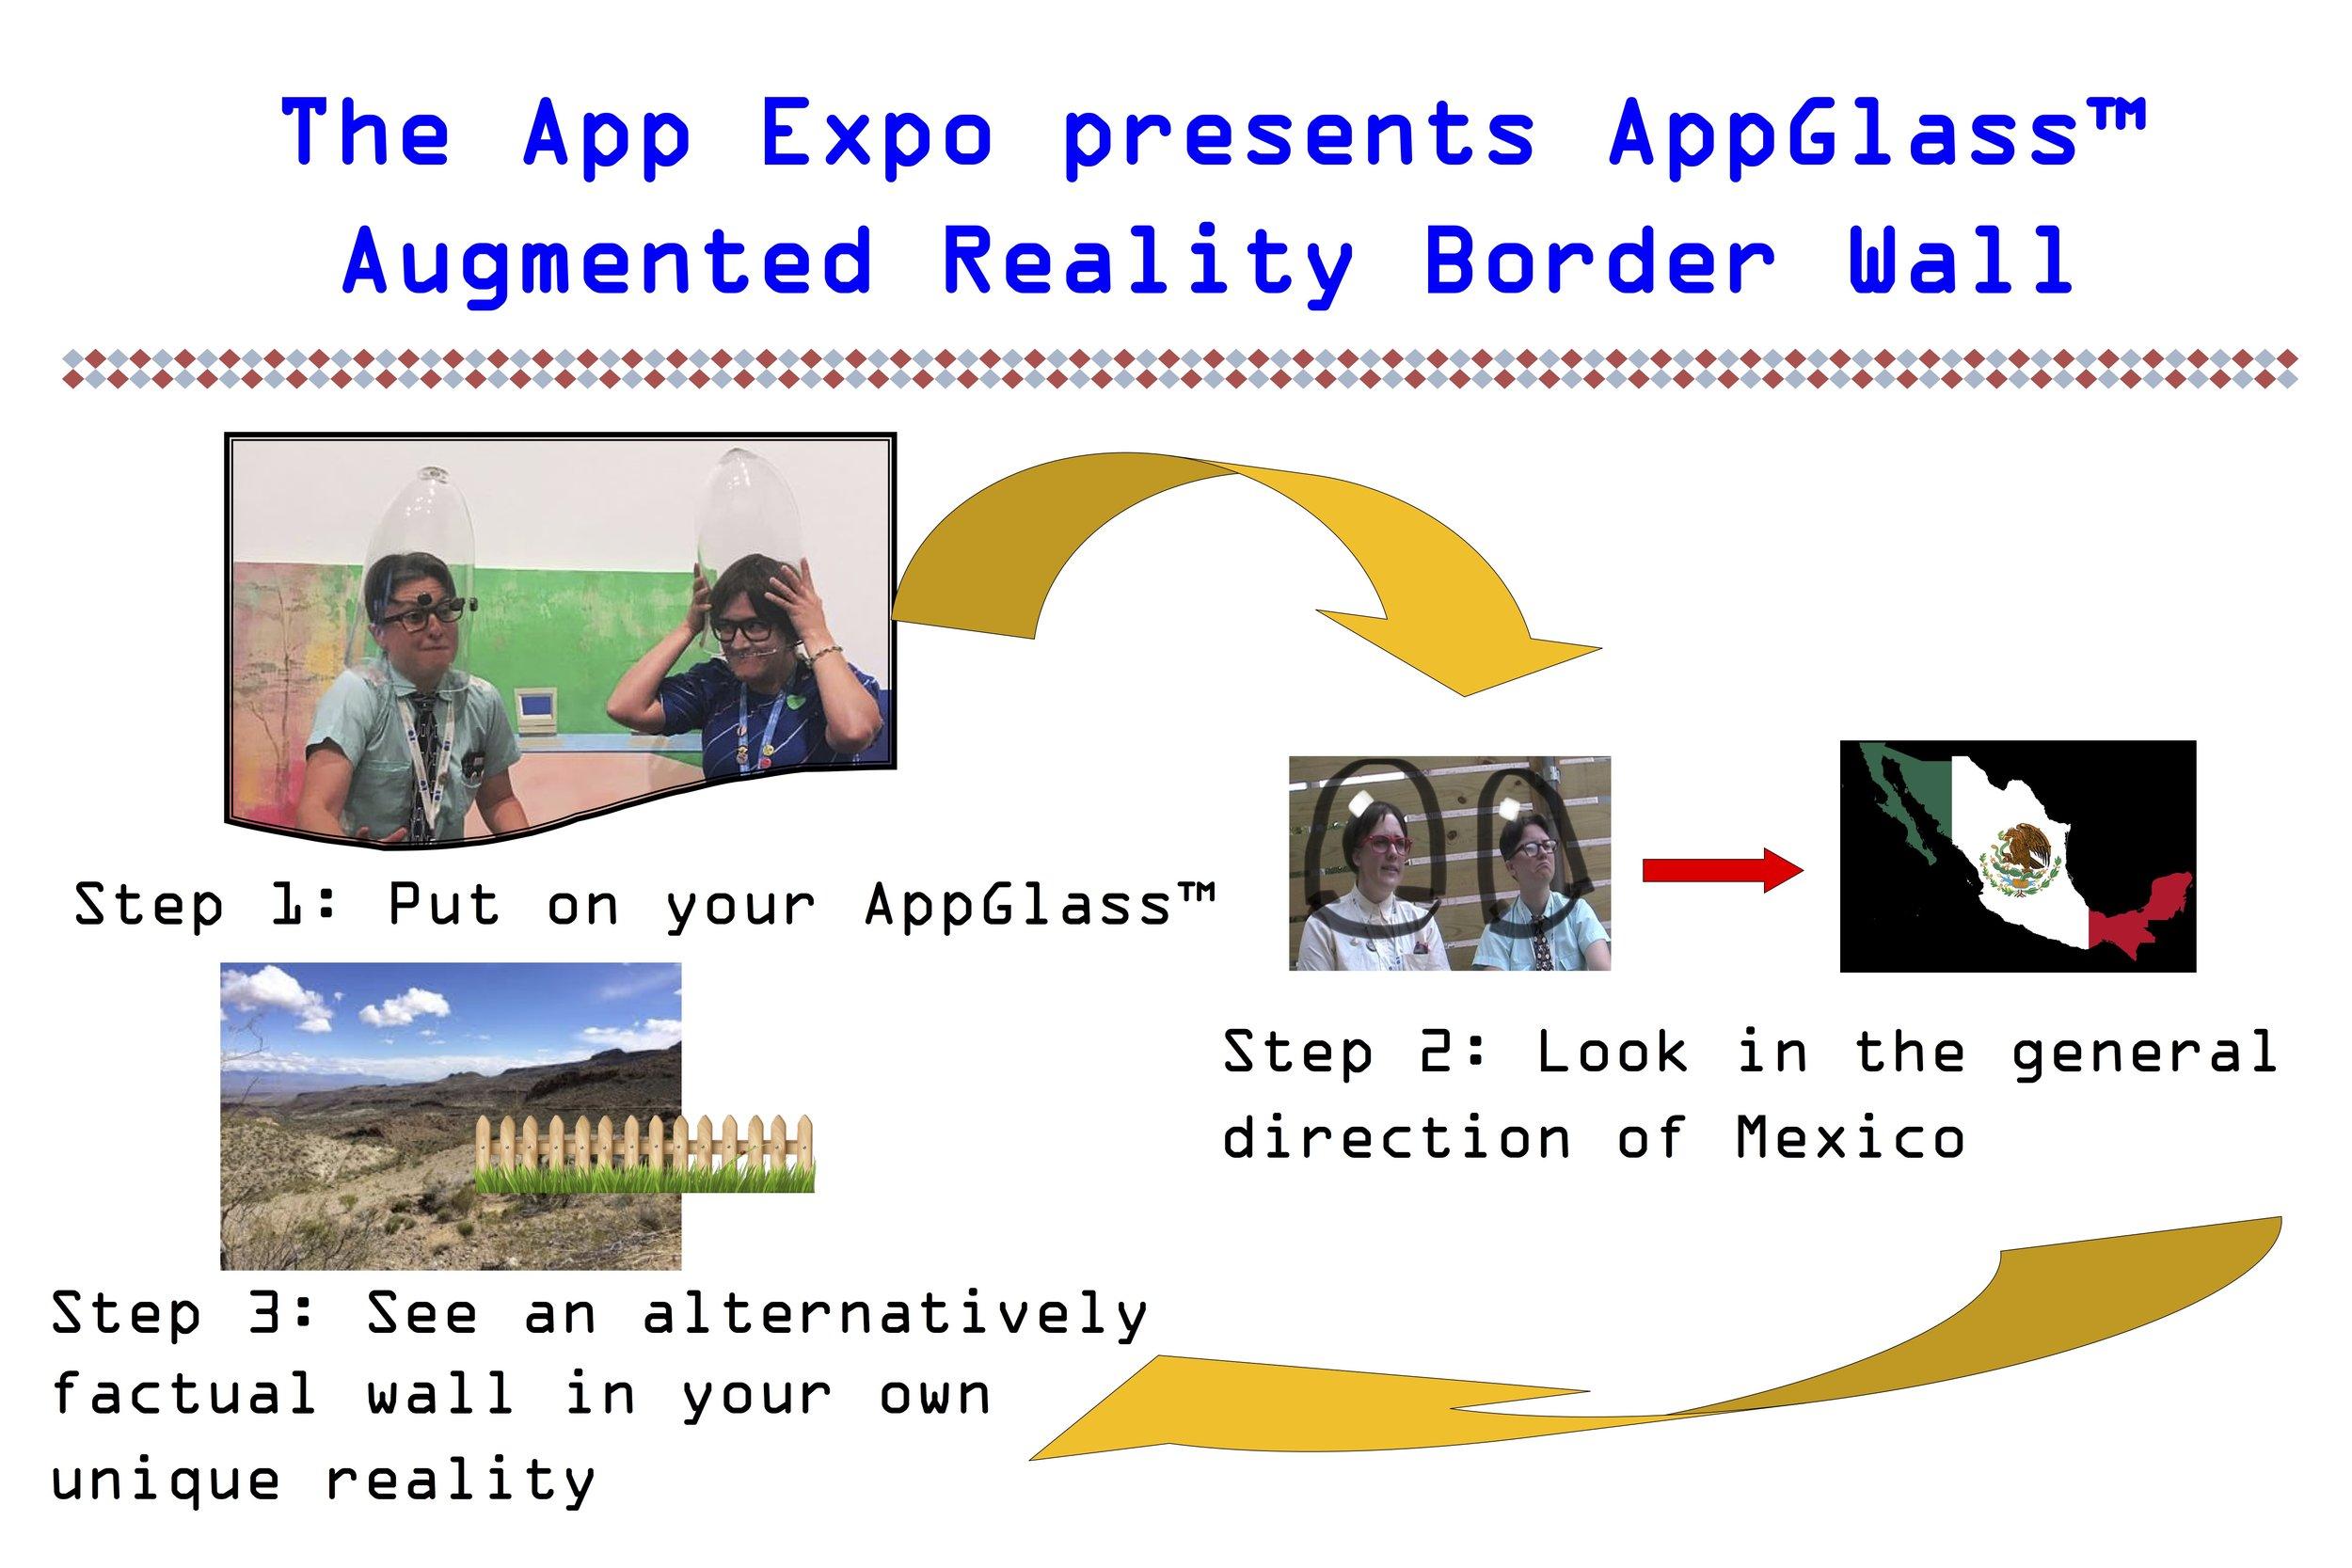 The App Expo